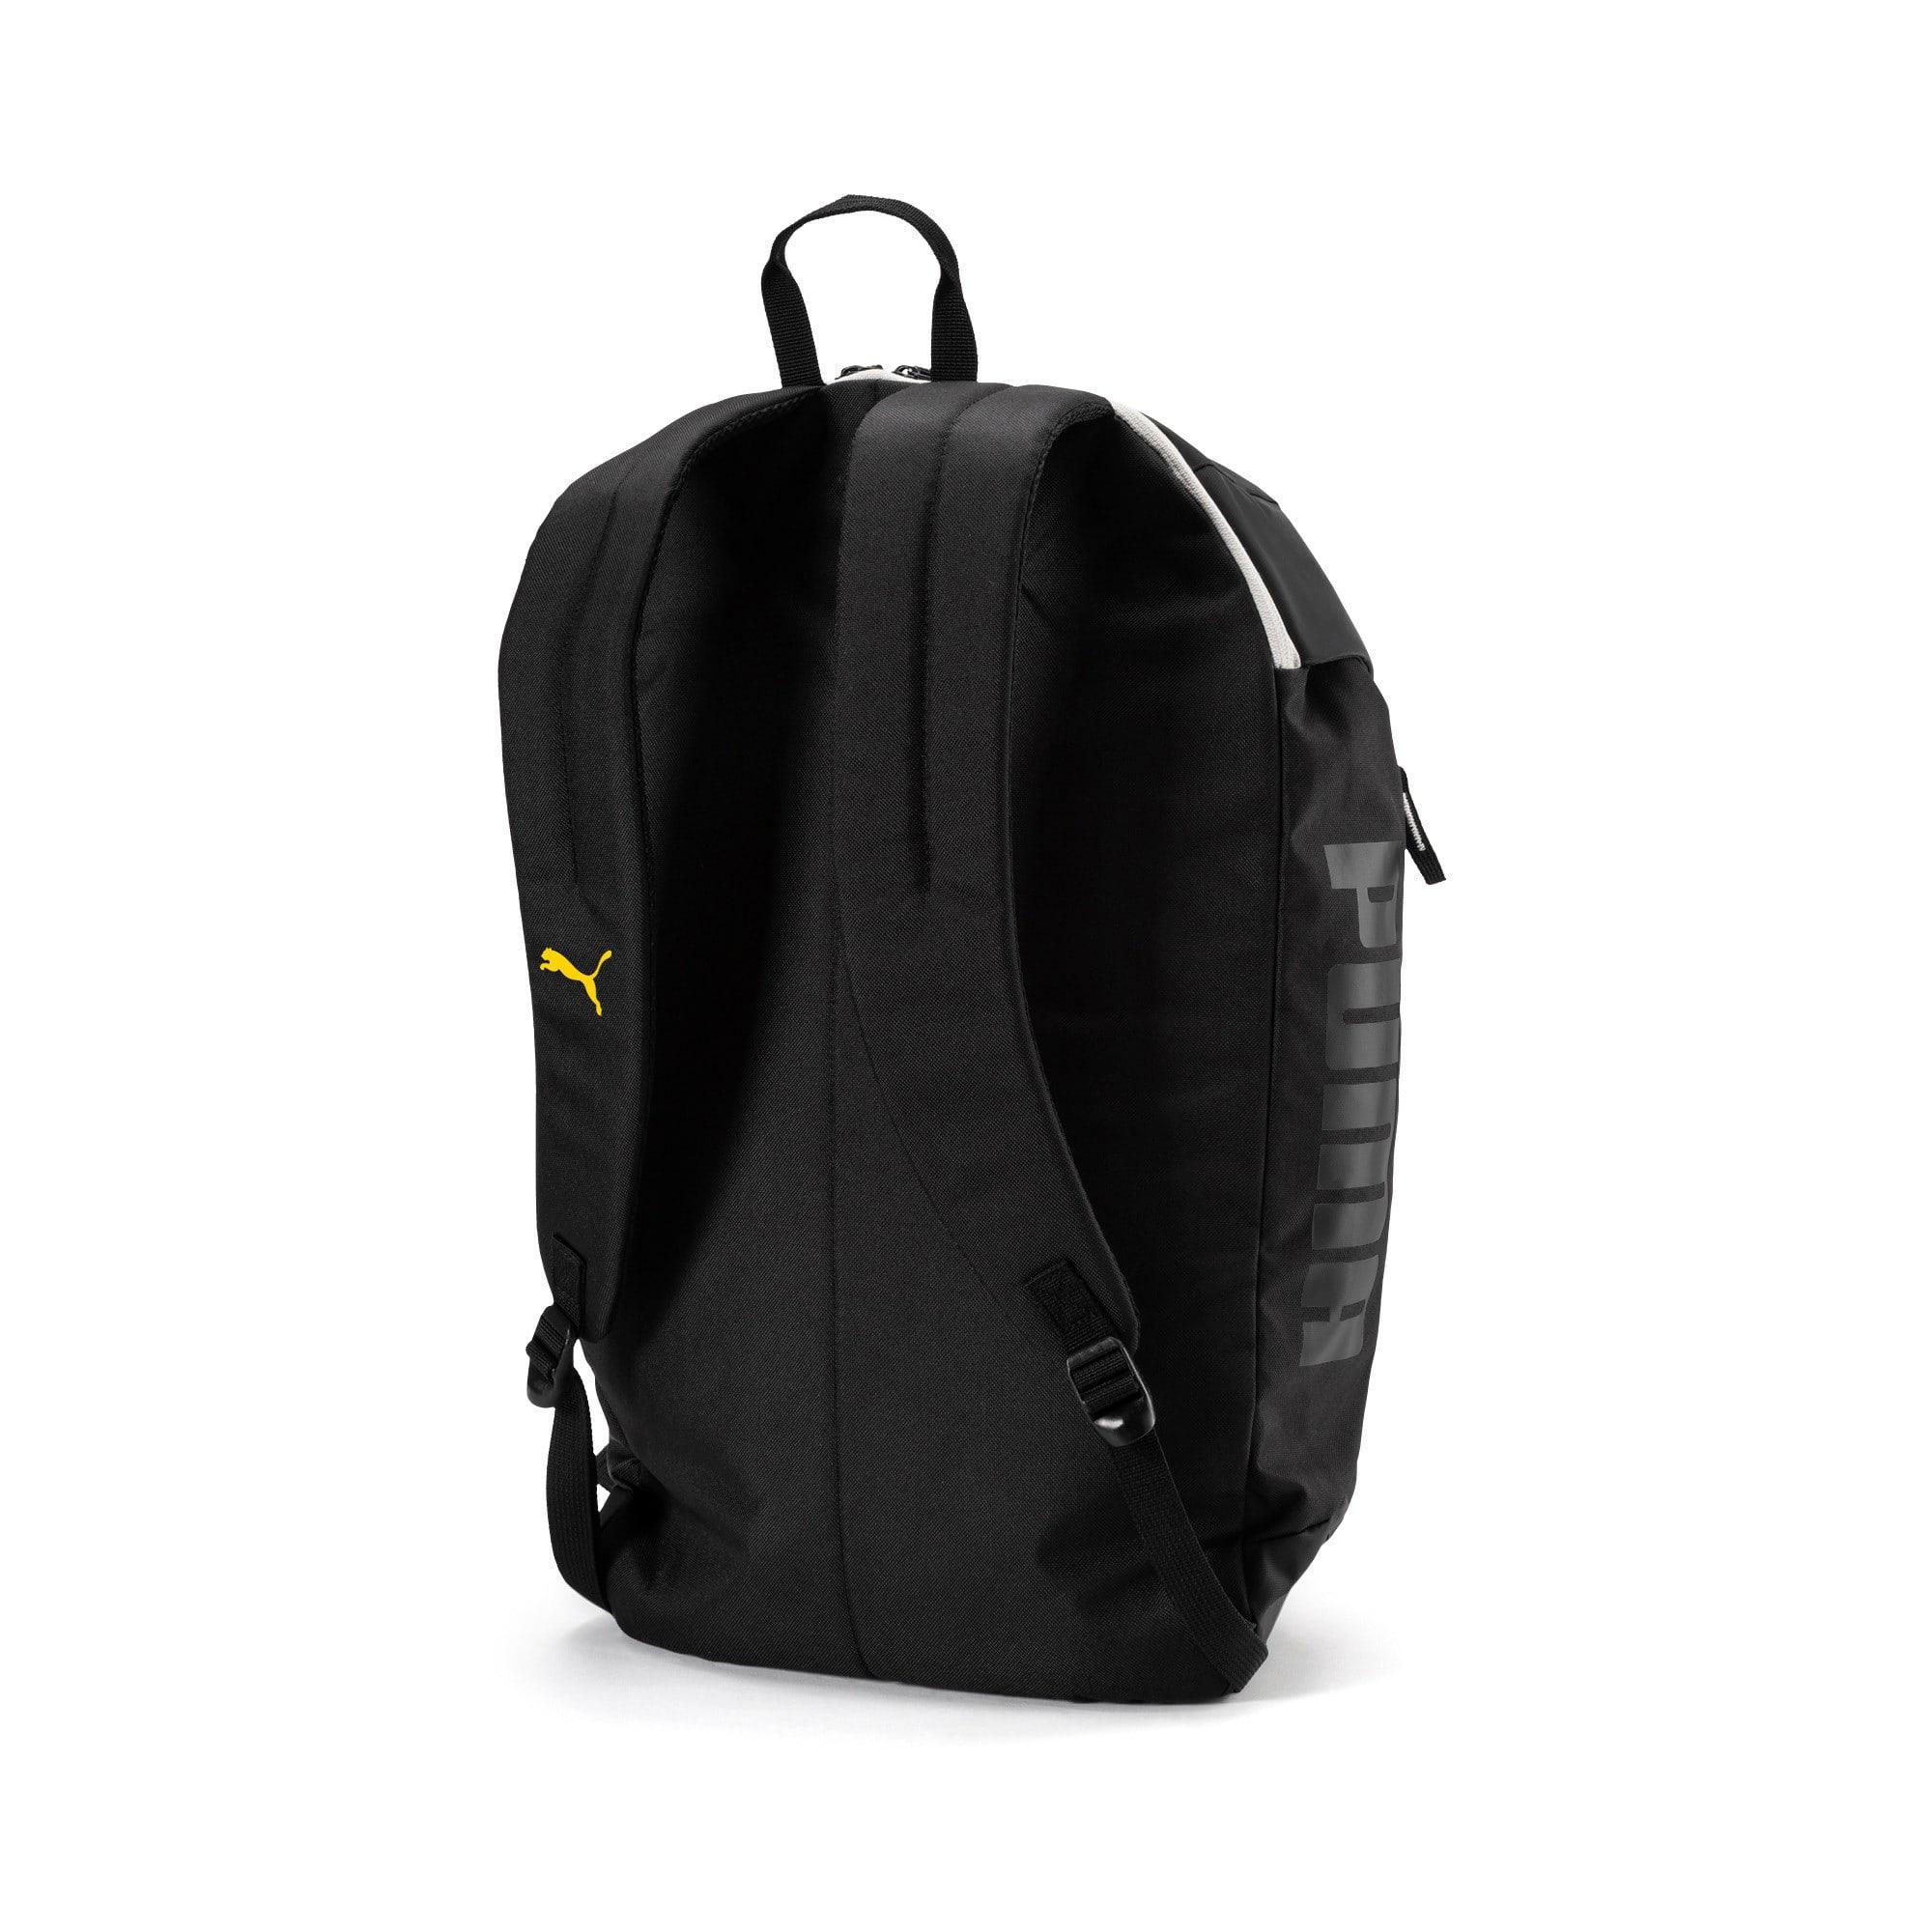 Thumbnail 2 of BVB 365 Backpack, Puma Black-Cyber Yellow, medium-IND